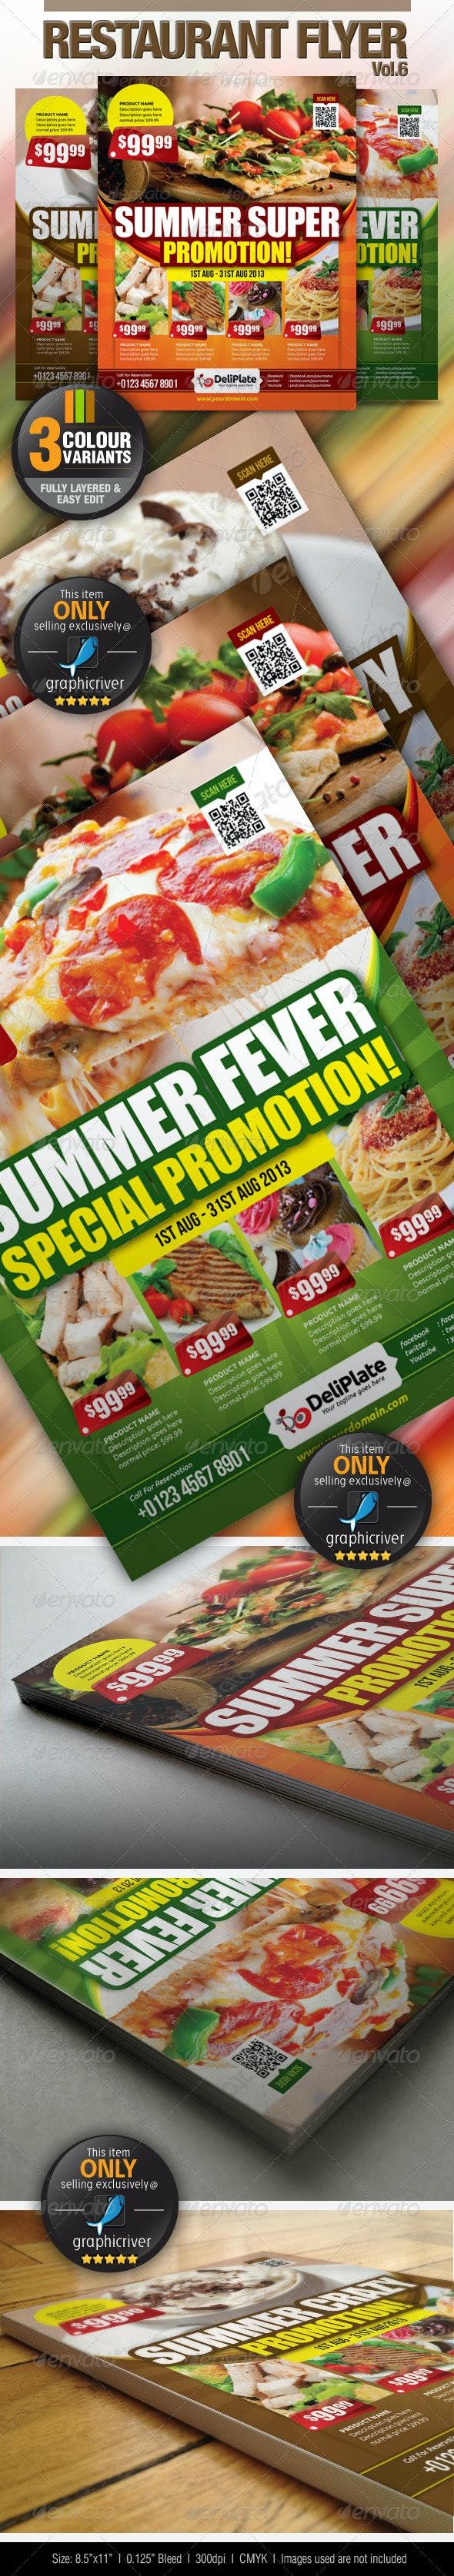 Restaurant Flyer Vol.6 - Restaurant Flyers